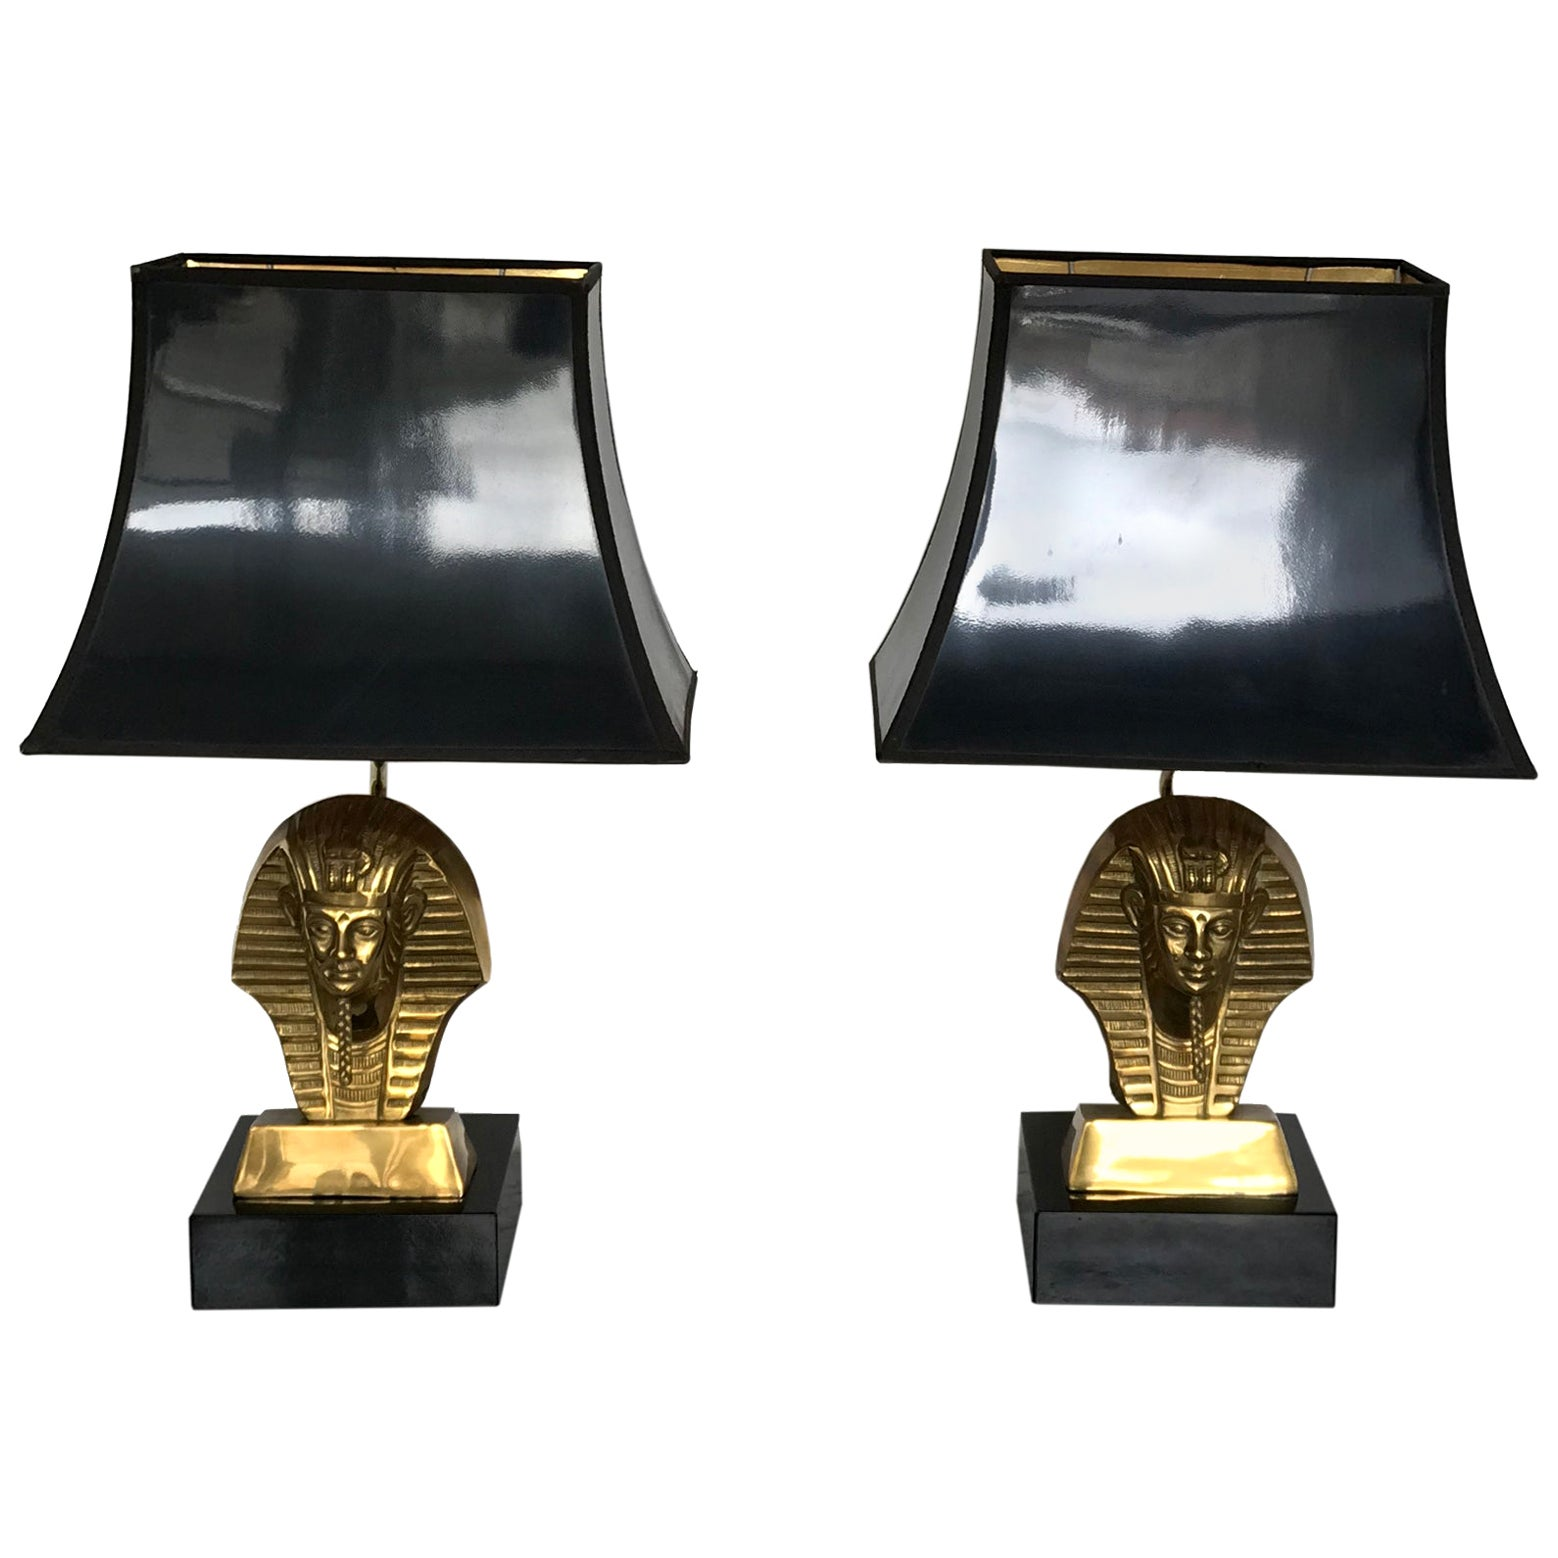 HOLLYWOOD REGENCY Pair of Pharaoh Table Lamps, 1960s